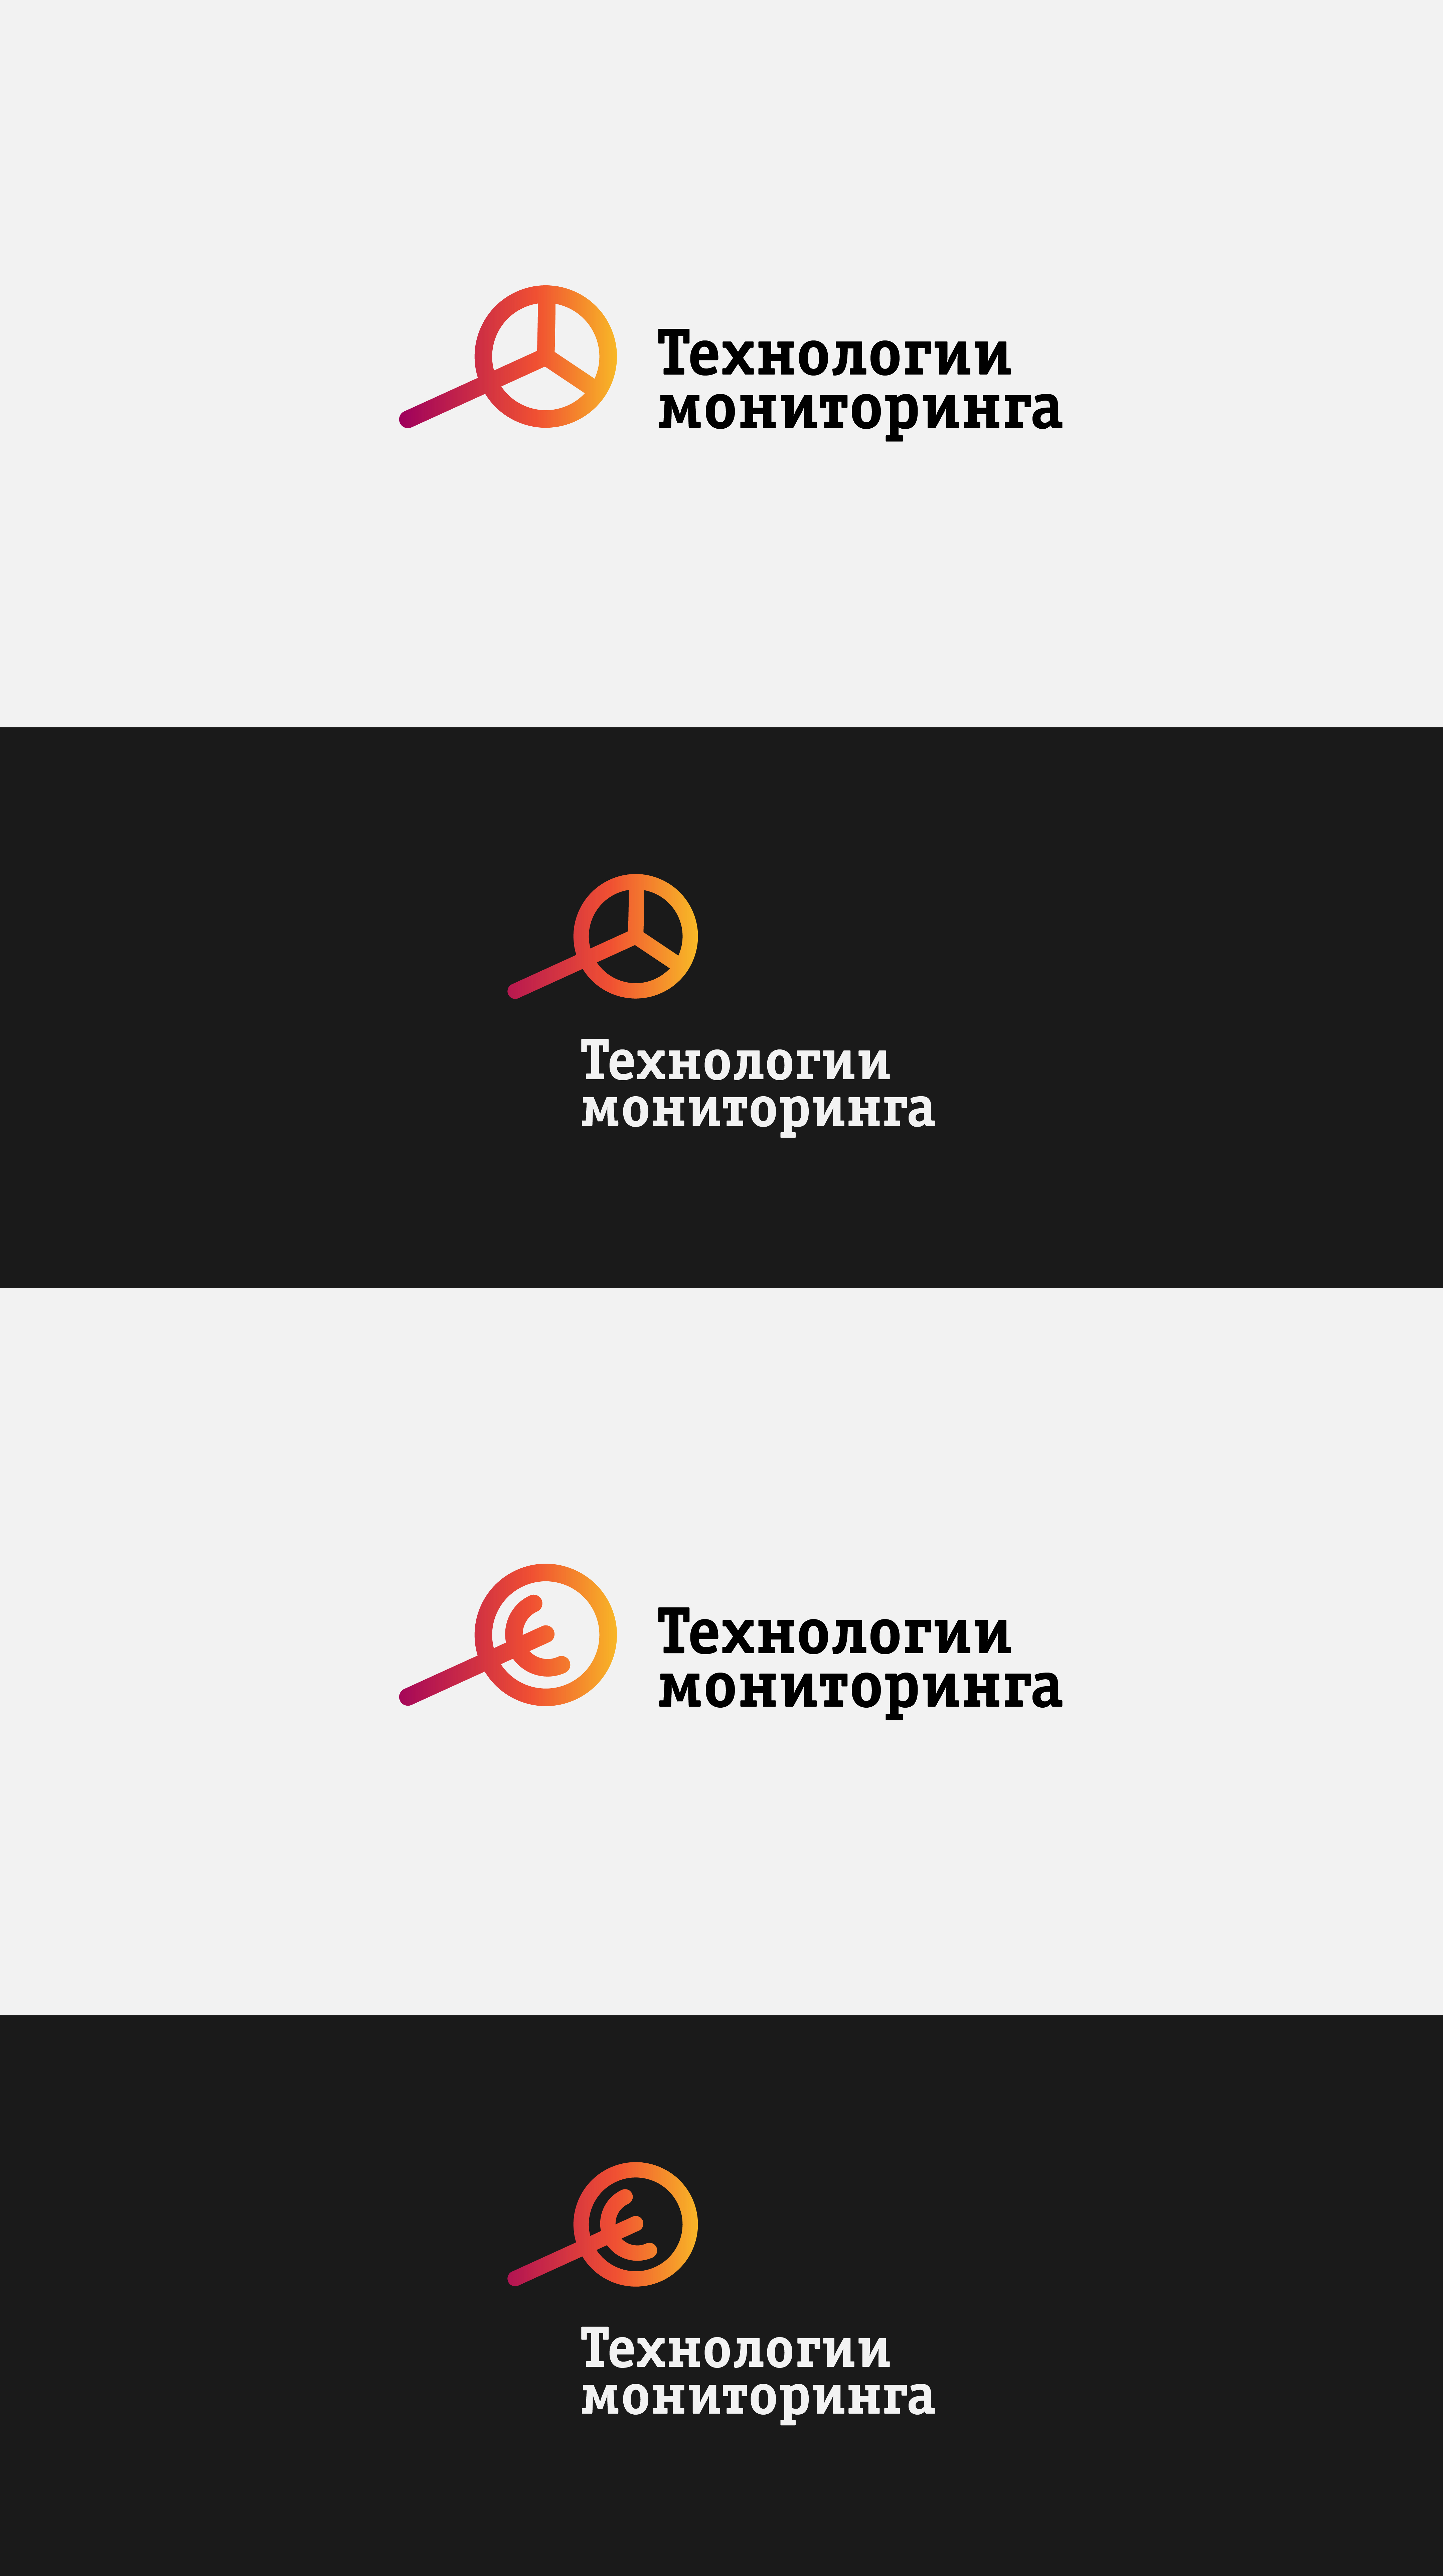 Разработка логотипа фото f_395597b16013bd00.jpg